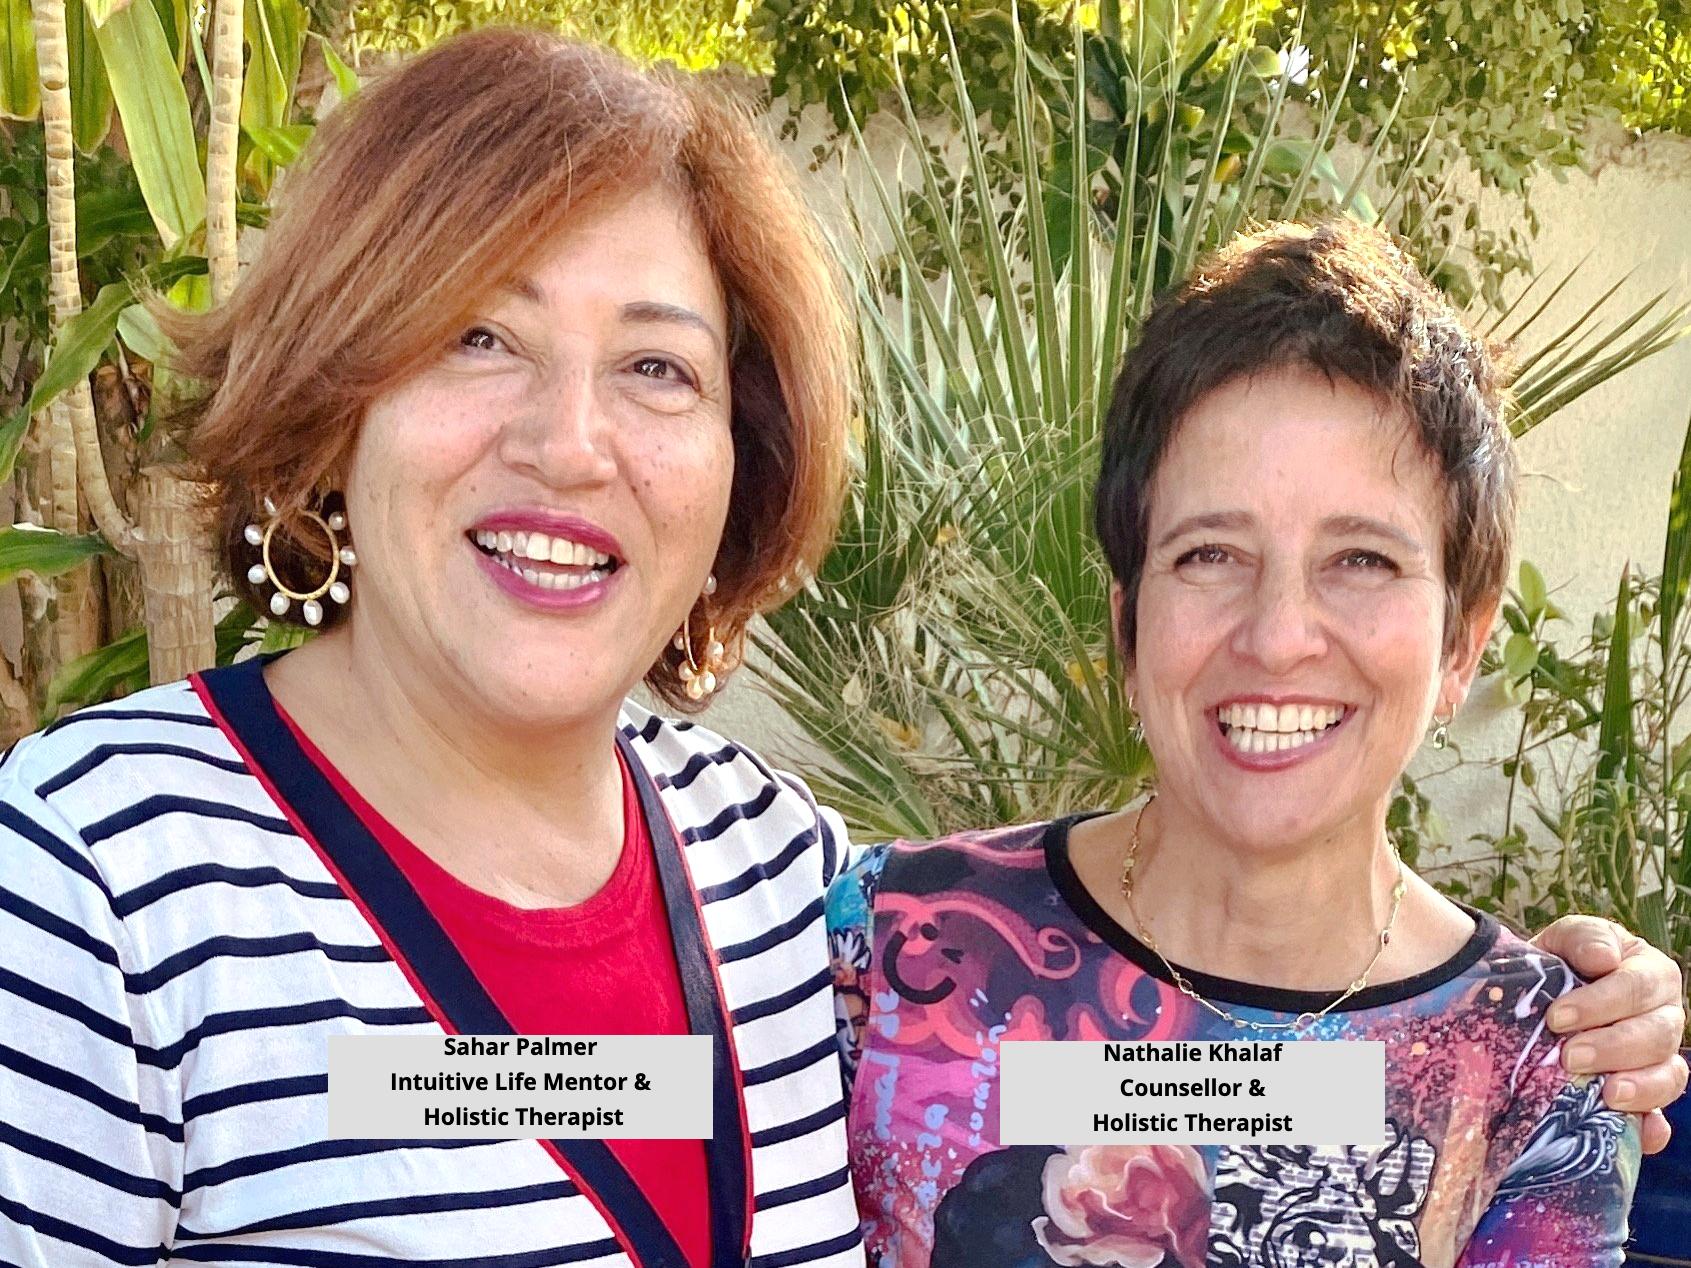 Sahar and Nathalie Holistic Counsellors